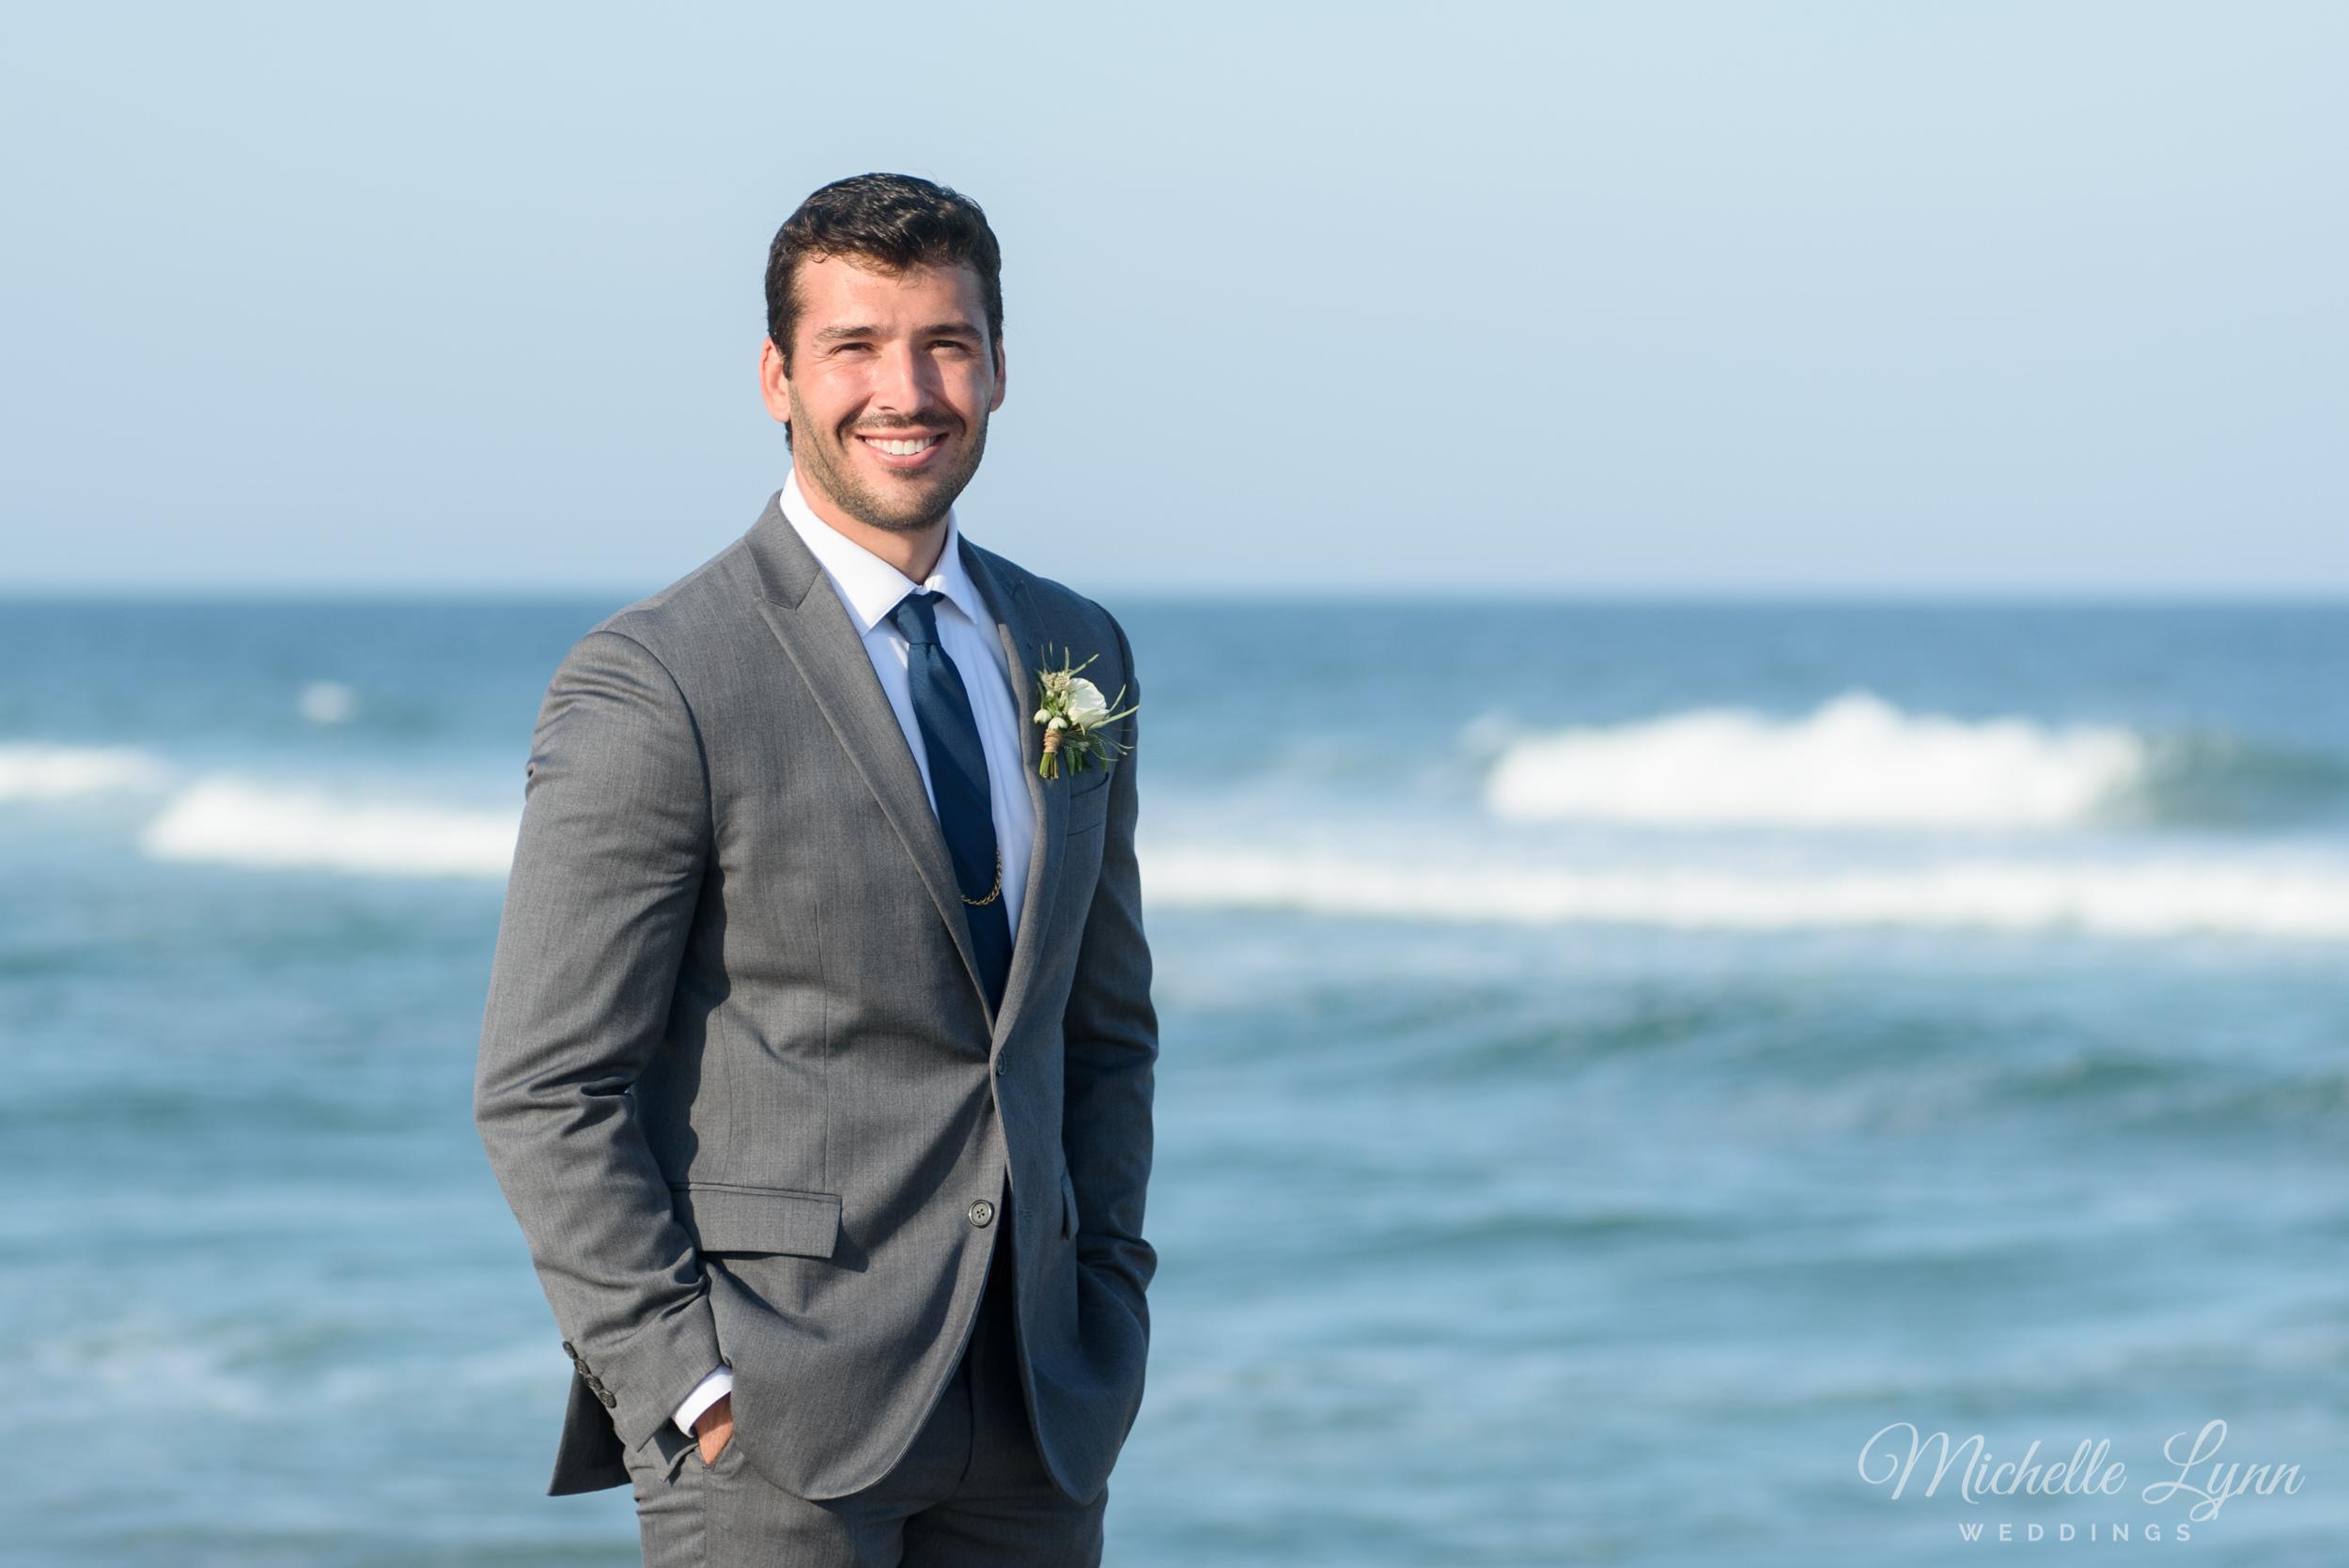 mlw-long-beach-island-new-jersey-wedding-photography-2.jpg